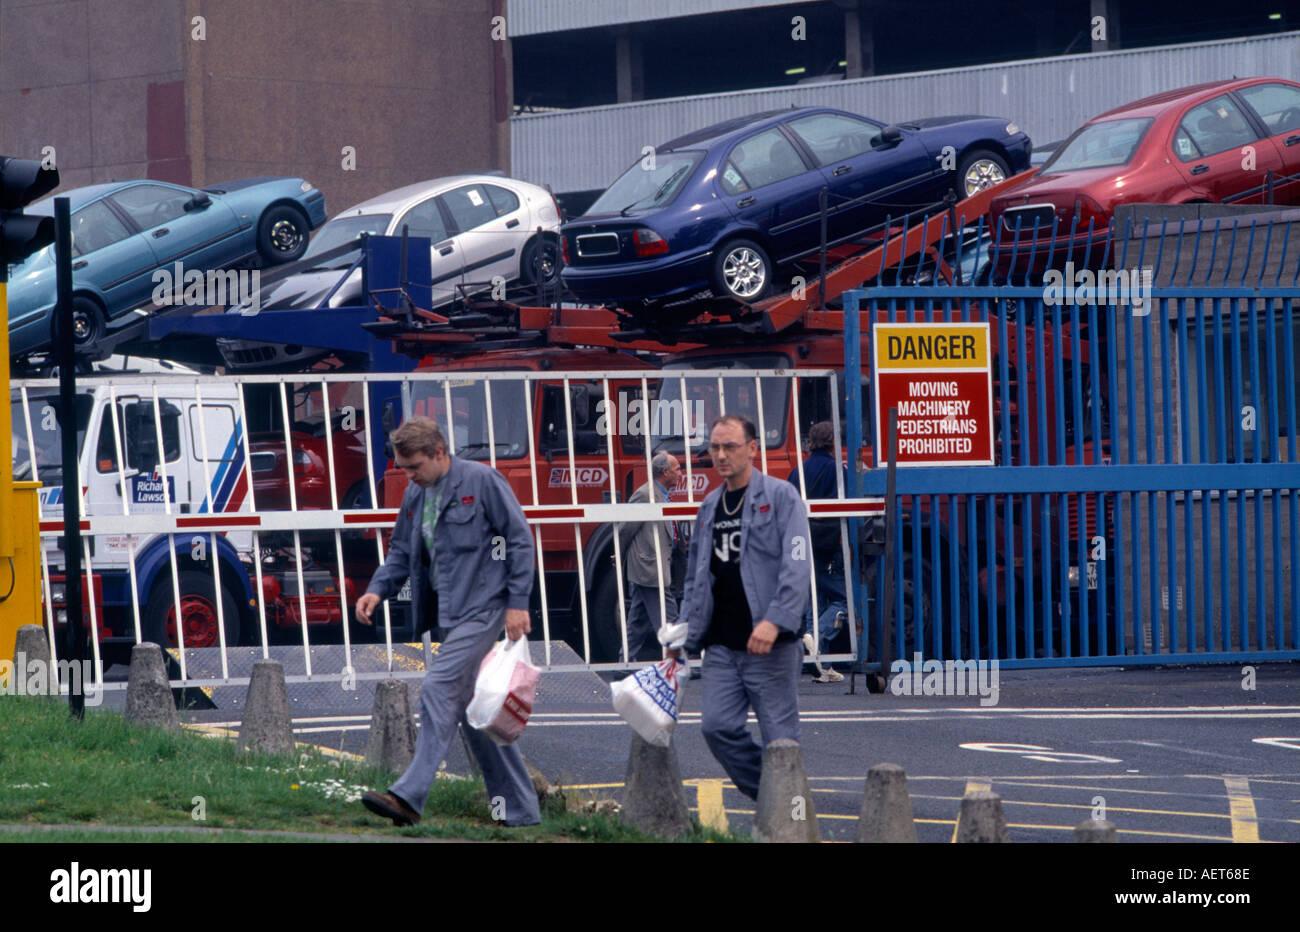 Arbeitnehmer Bei Longbridge Rover Bmw Automobilfabrik In Birmingham Uk Stockfotografie Alamy